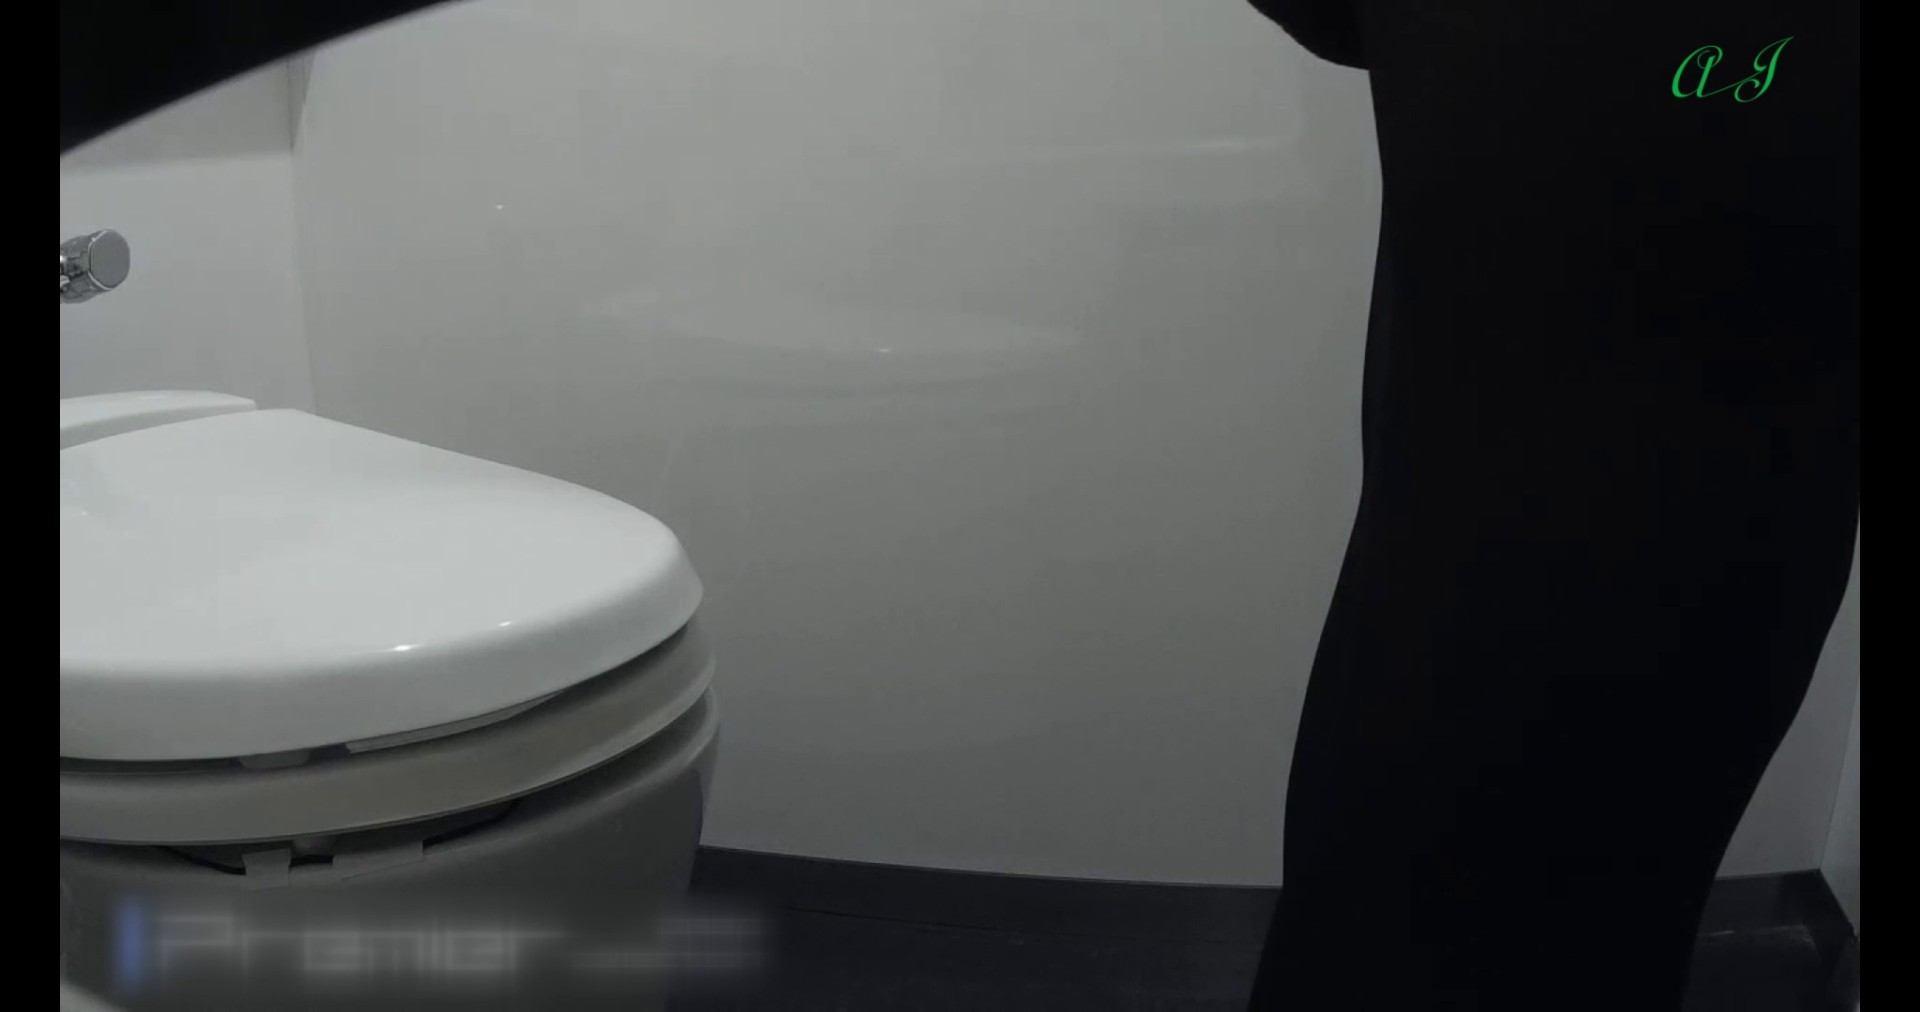 【某有名大学女性洗面所】有名大学女性洗面所 vol.74 後編 和式トイレ おまんこ動画流出 81pic 19